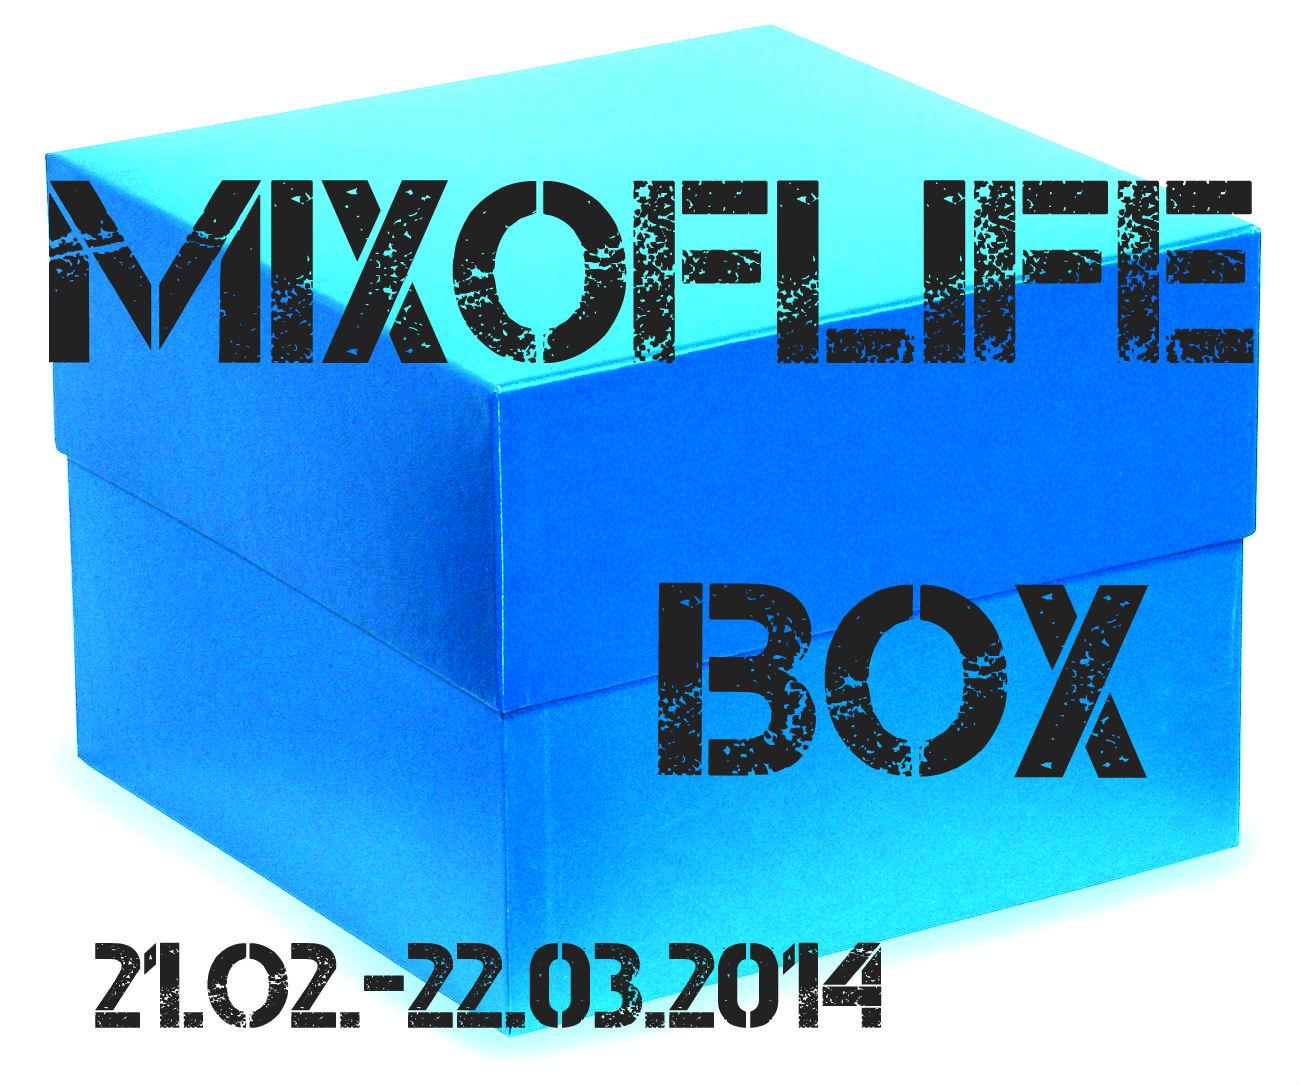 http://mymixoflife.blogspot.com/2014/02/mixoflife-box-czyli-paka-w-ciemno-do.html